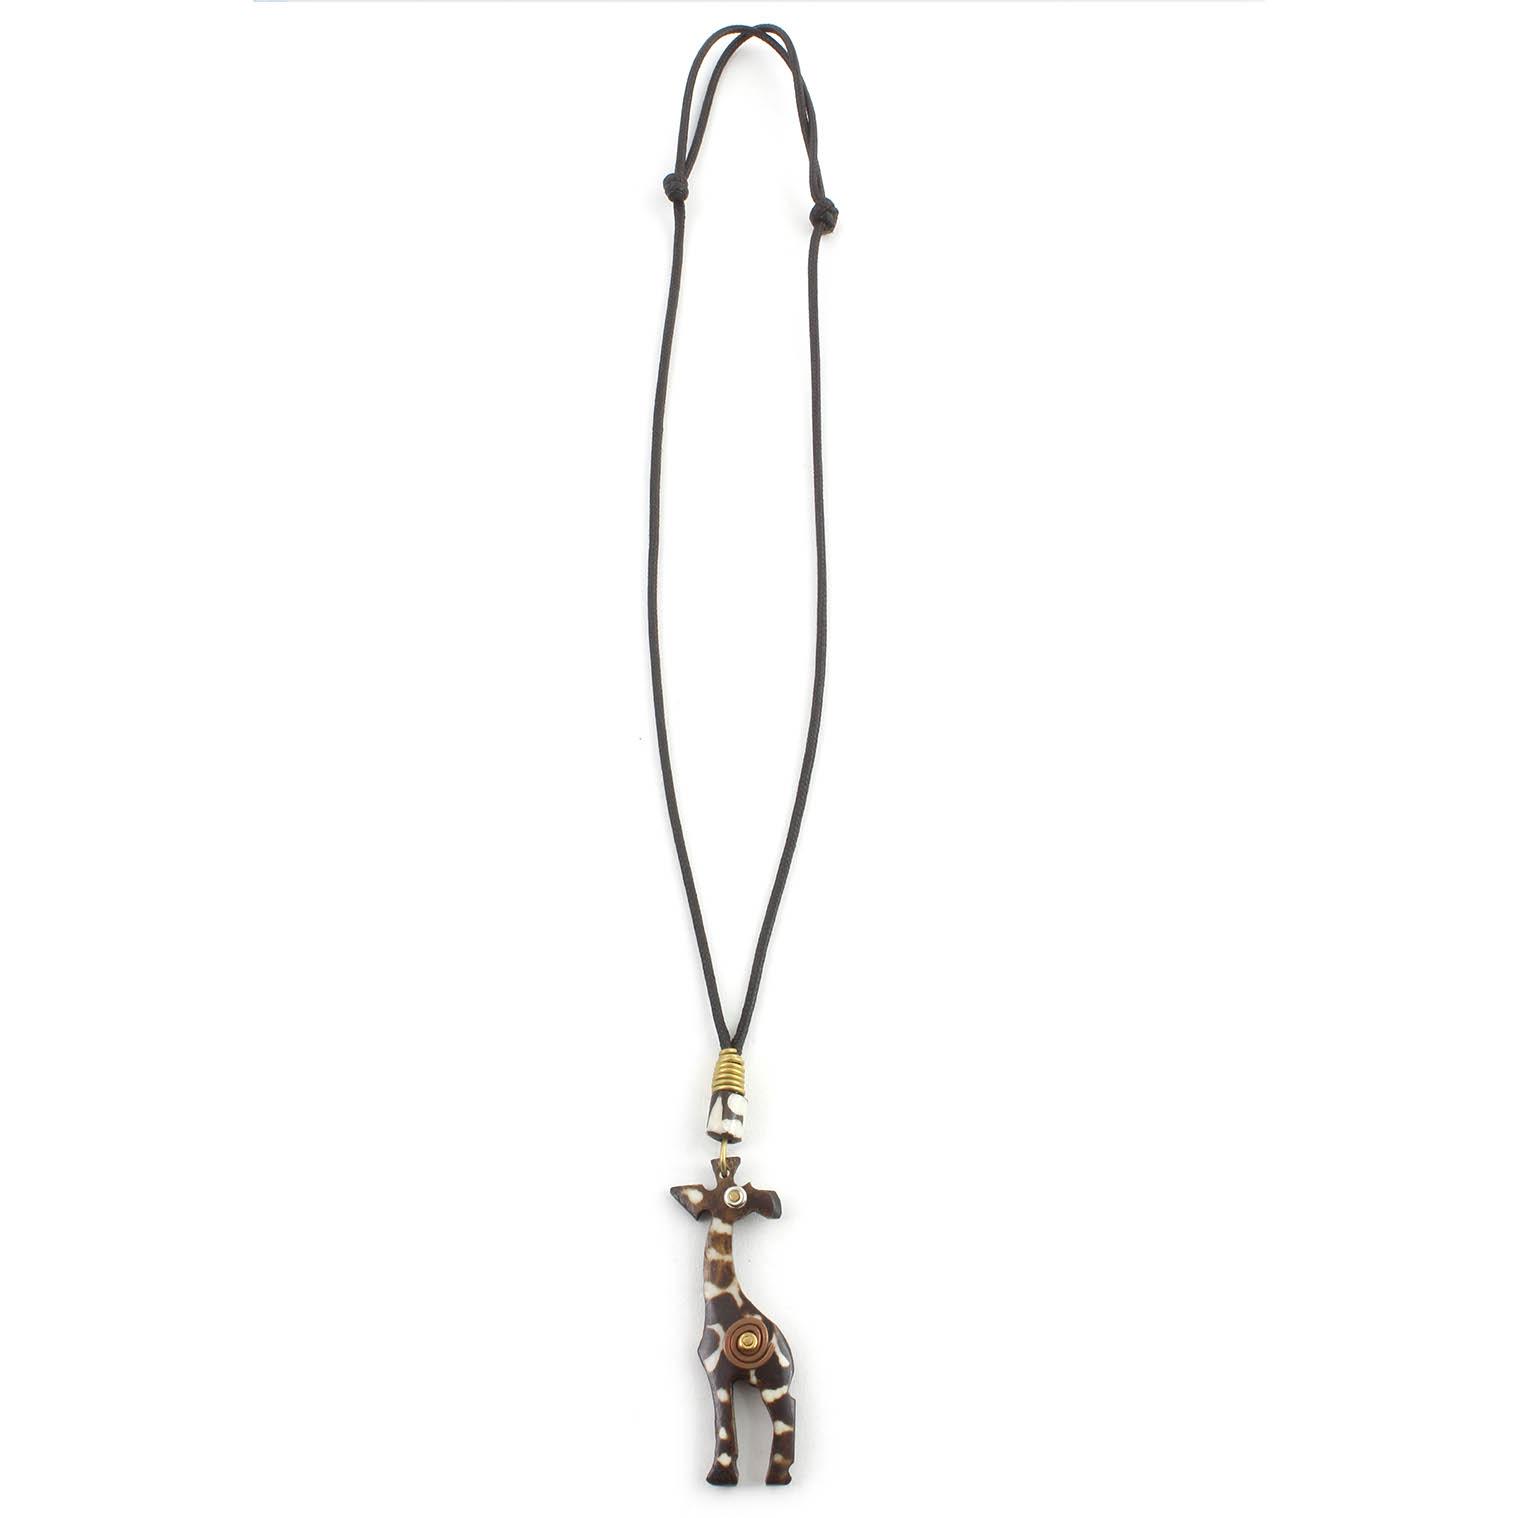 Spiral Giraffe Necklace